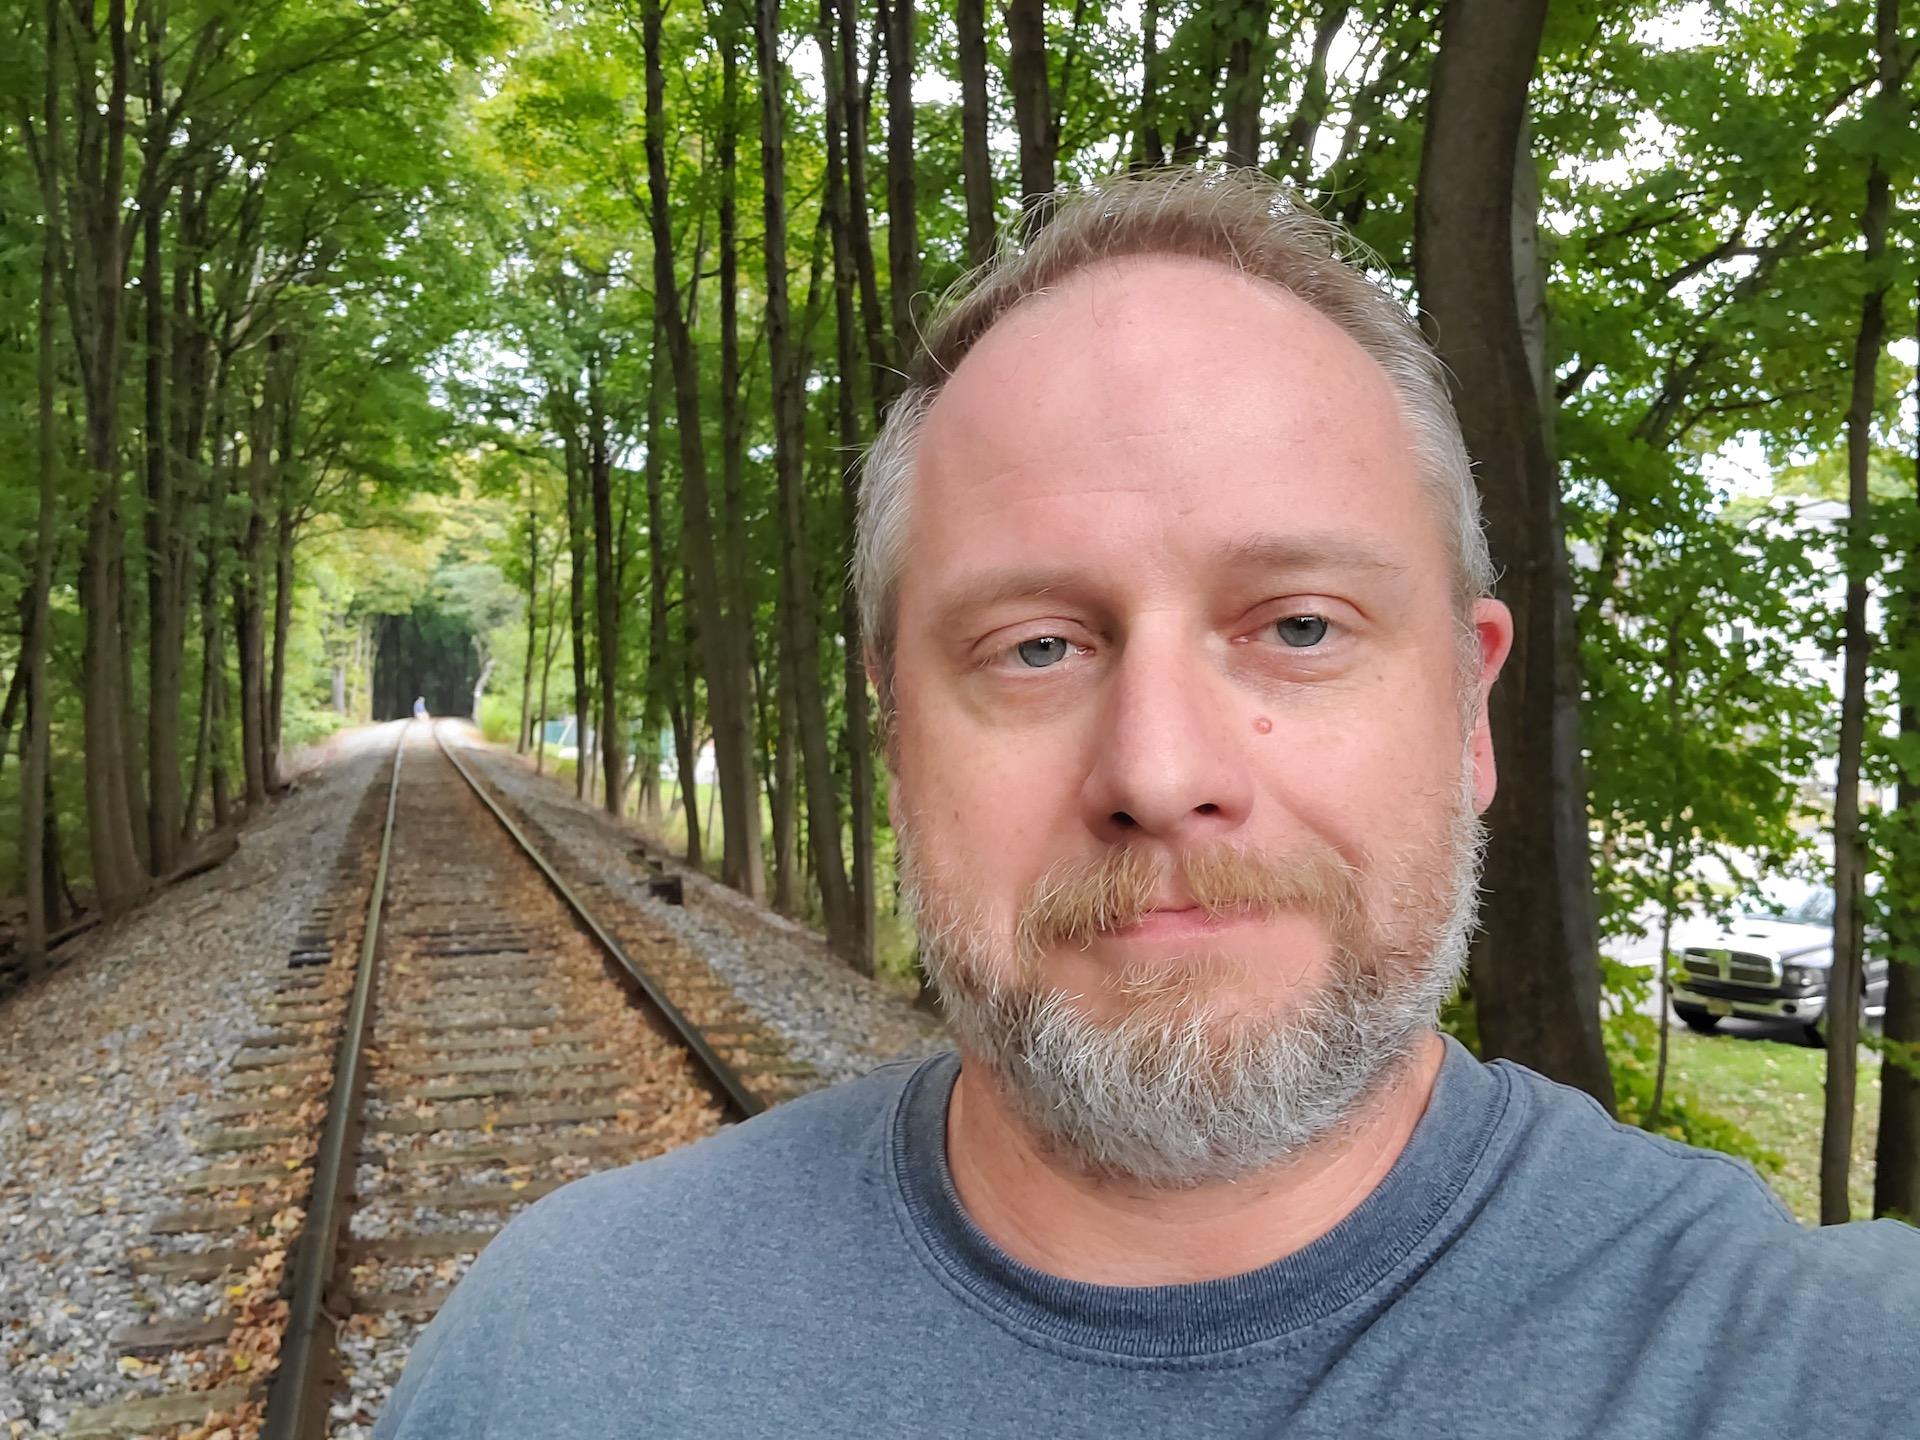 Samsung Galaxy Fold review camera sample track selfie